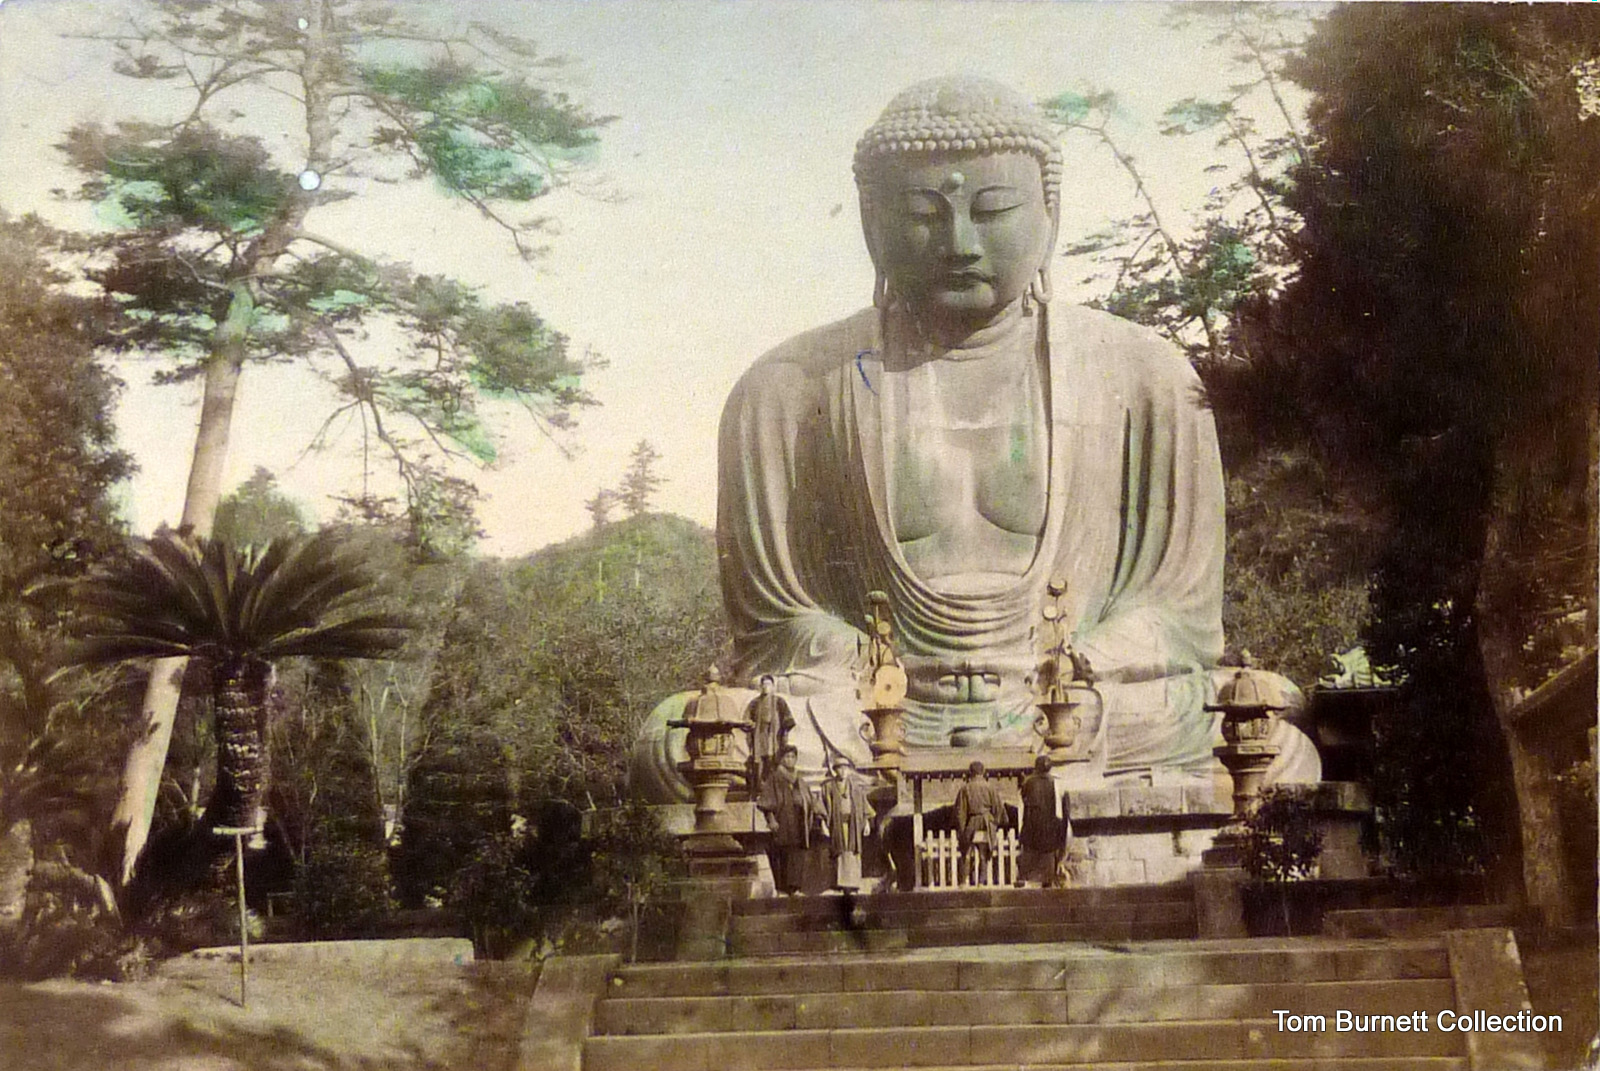 Burnett Collection Ogawa Album